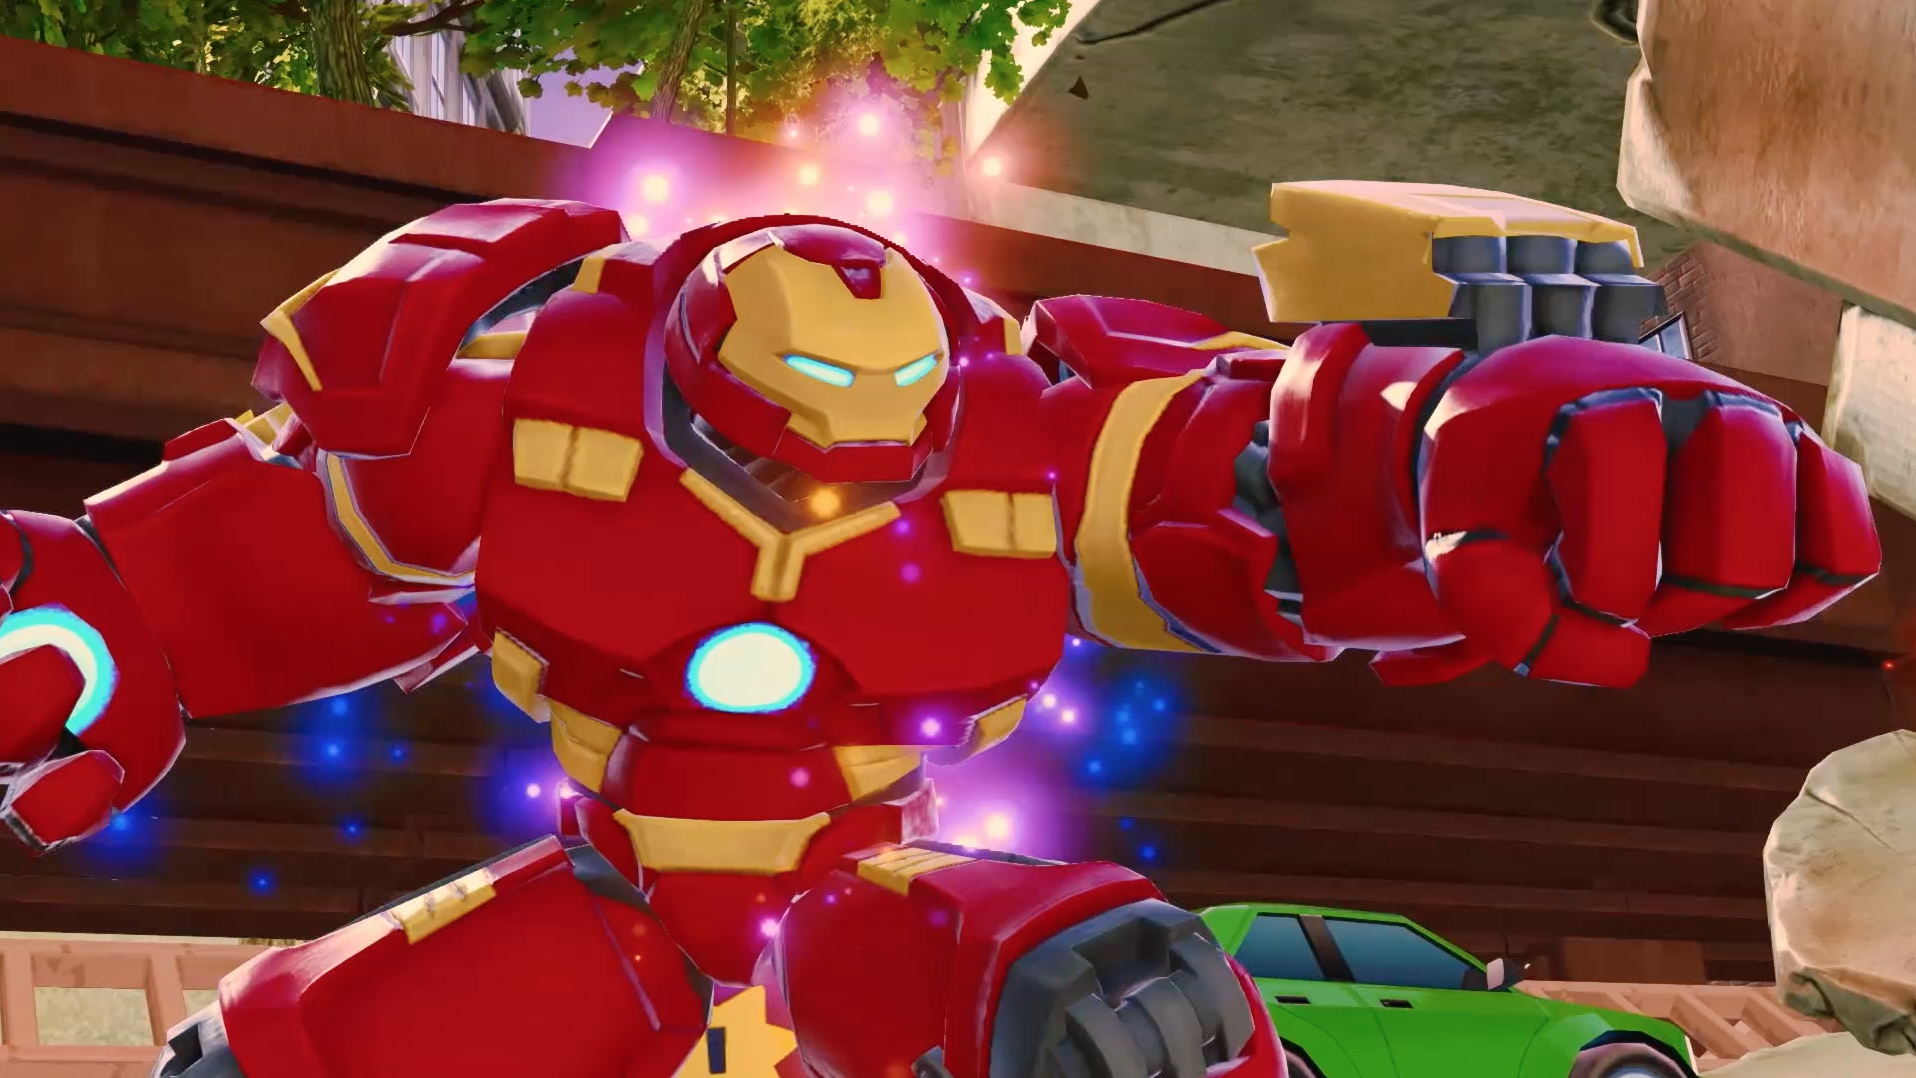 Marvel Battlegrounds Playset - Infinity 3.0 Edition